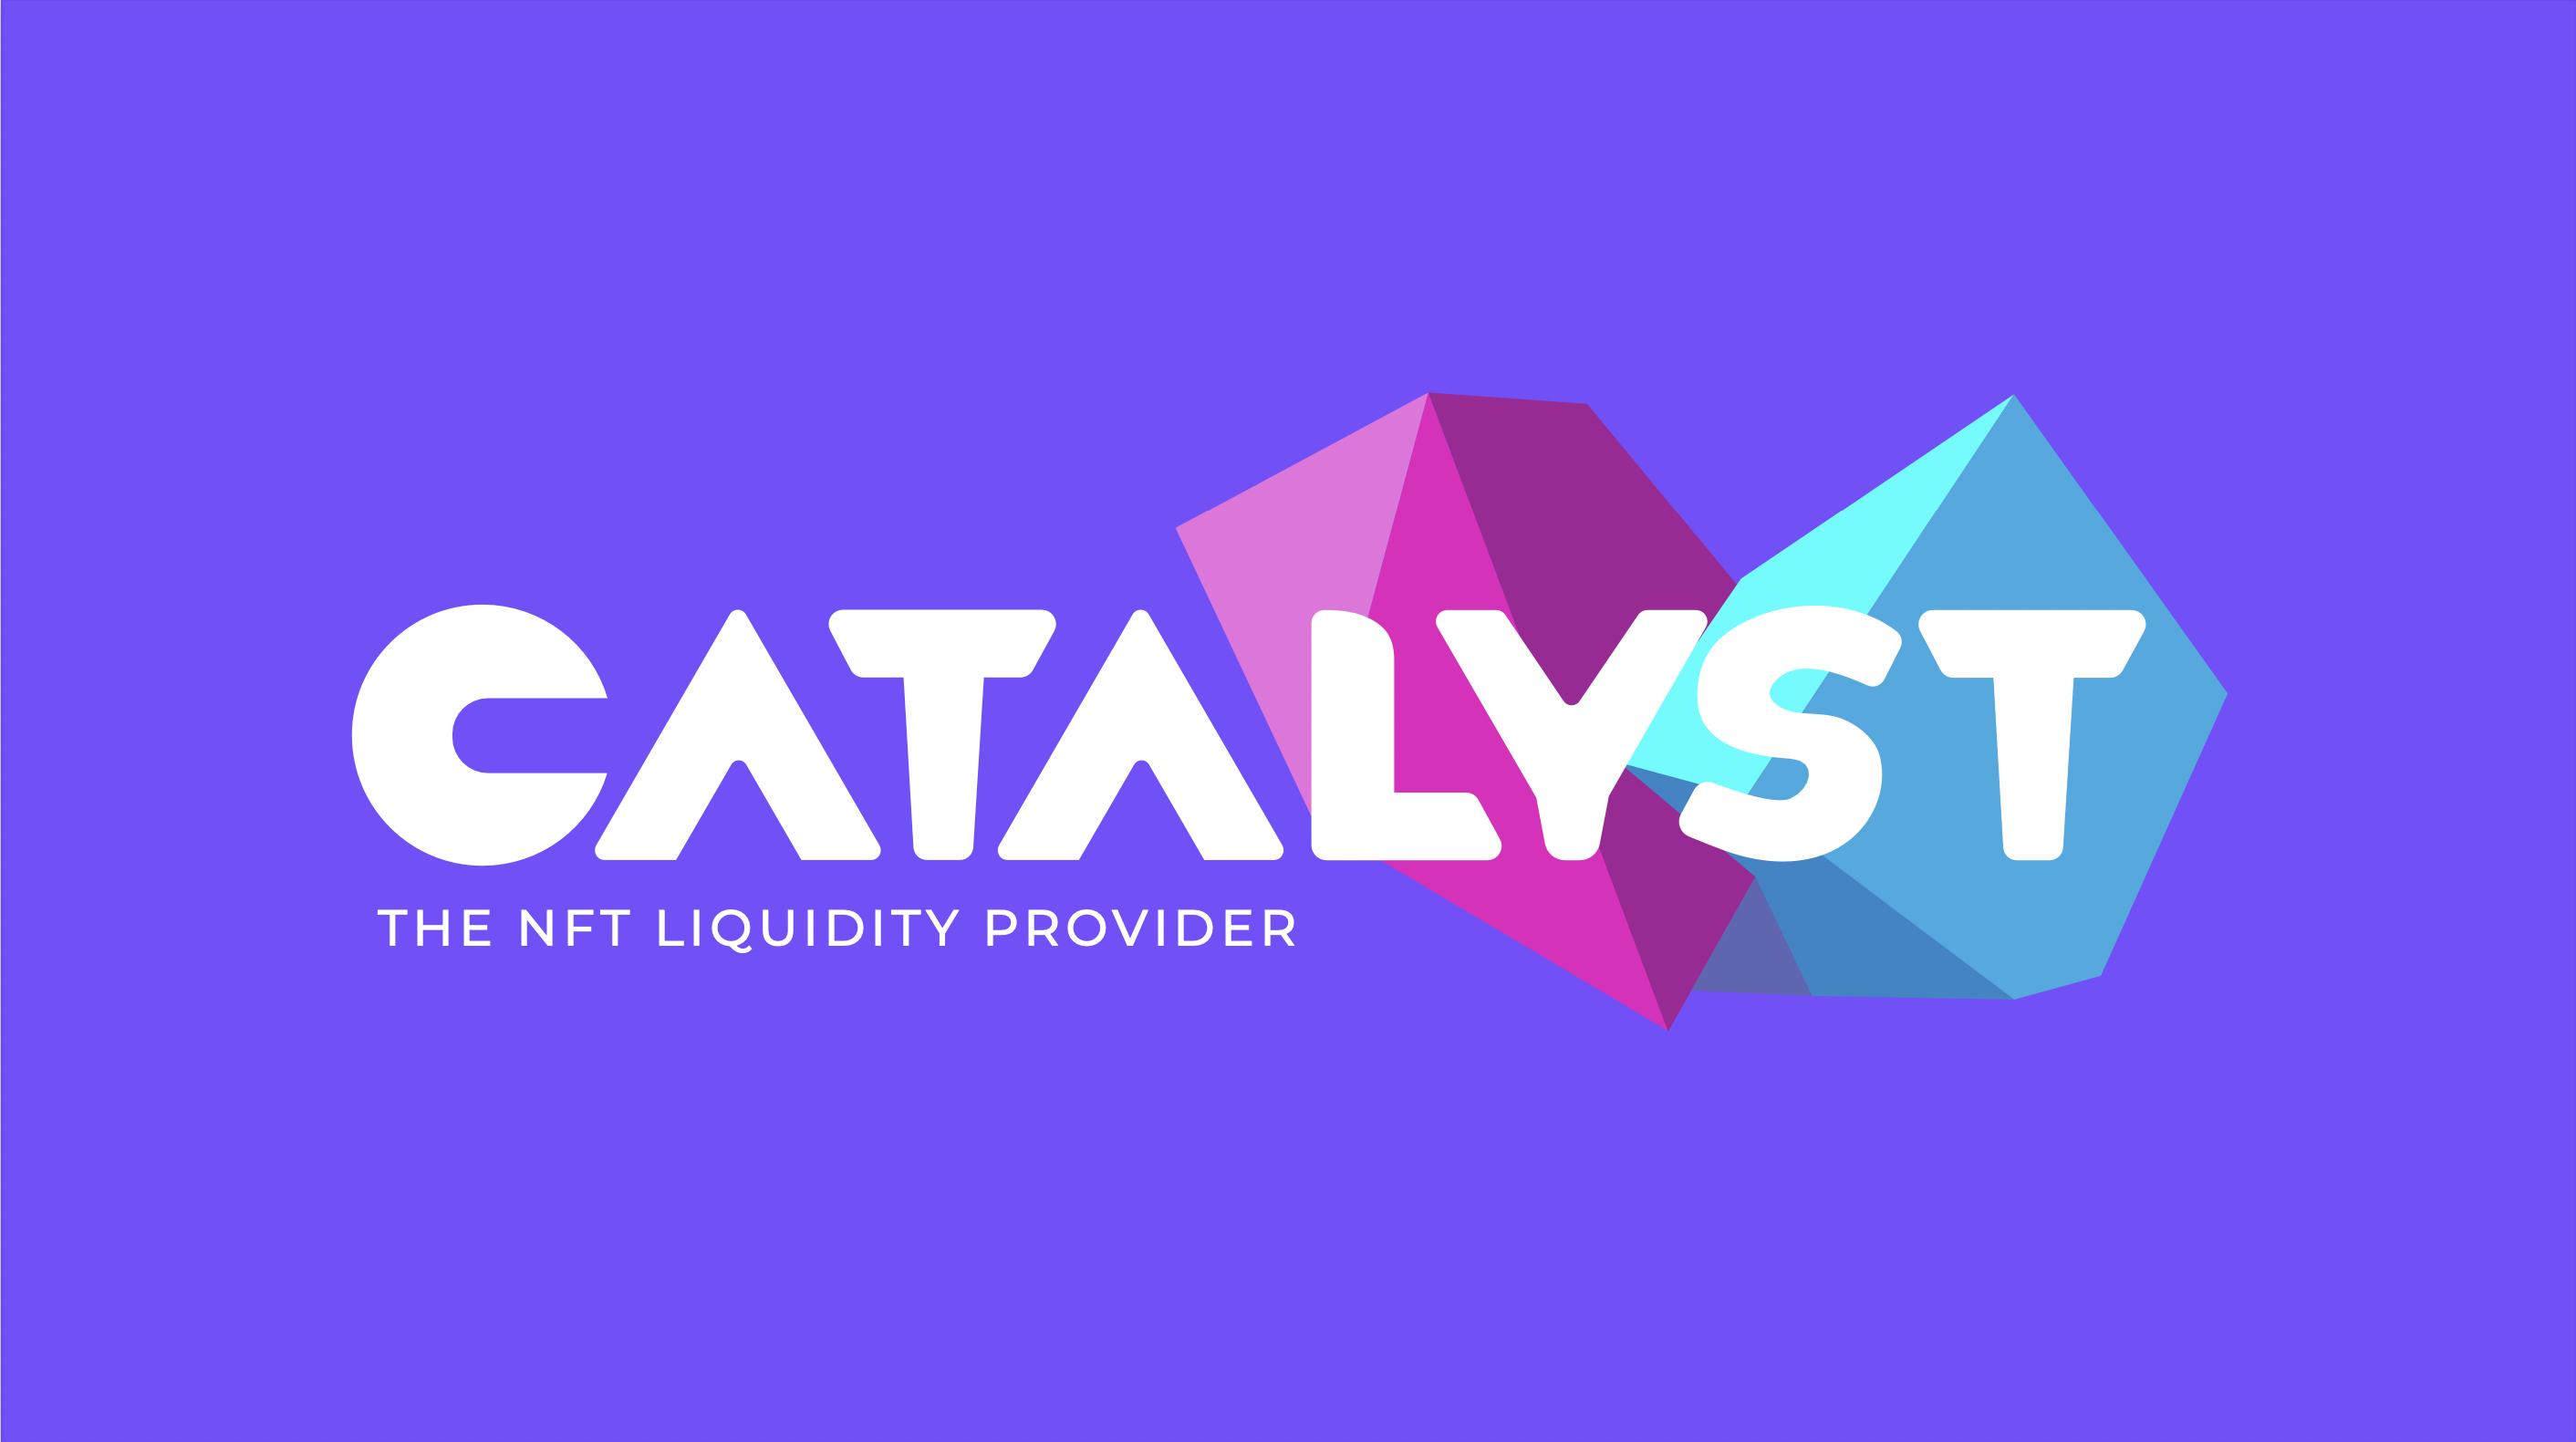 Catalyst showcase